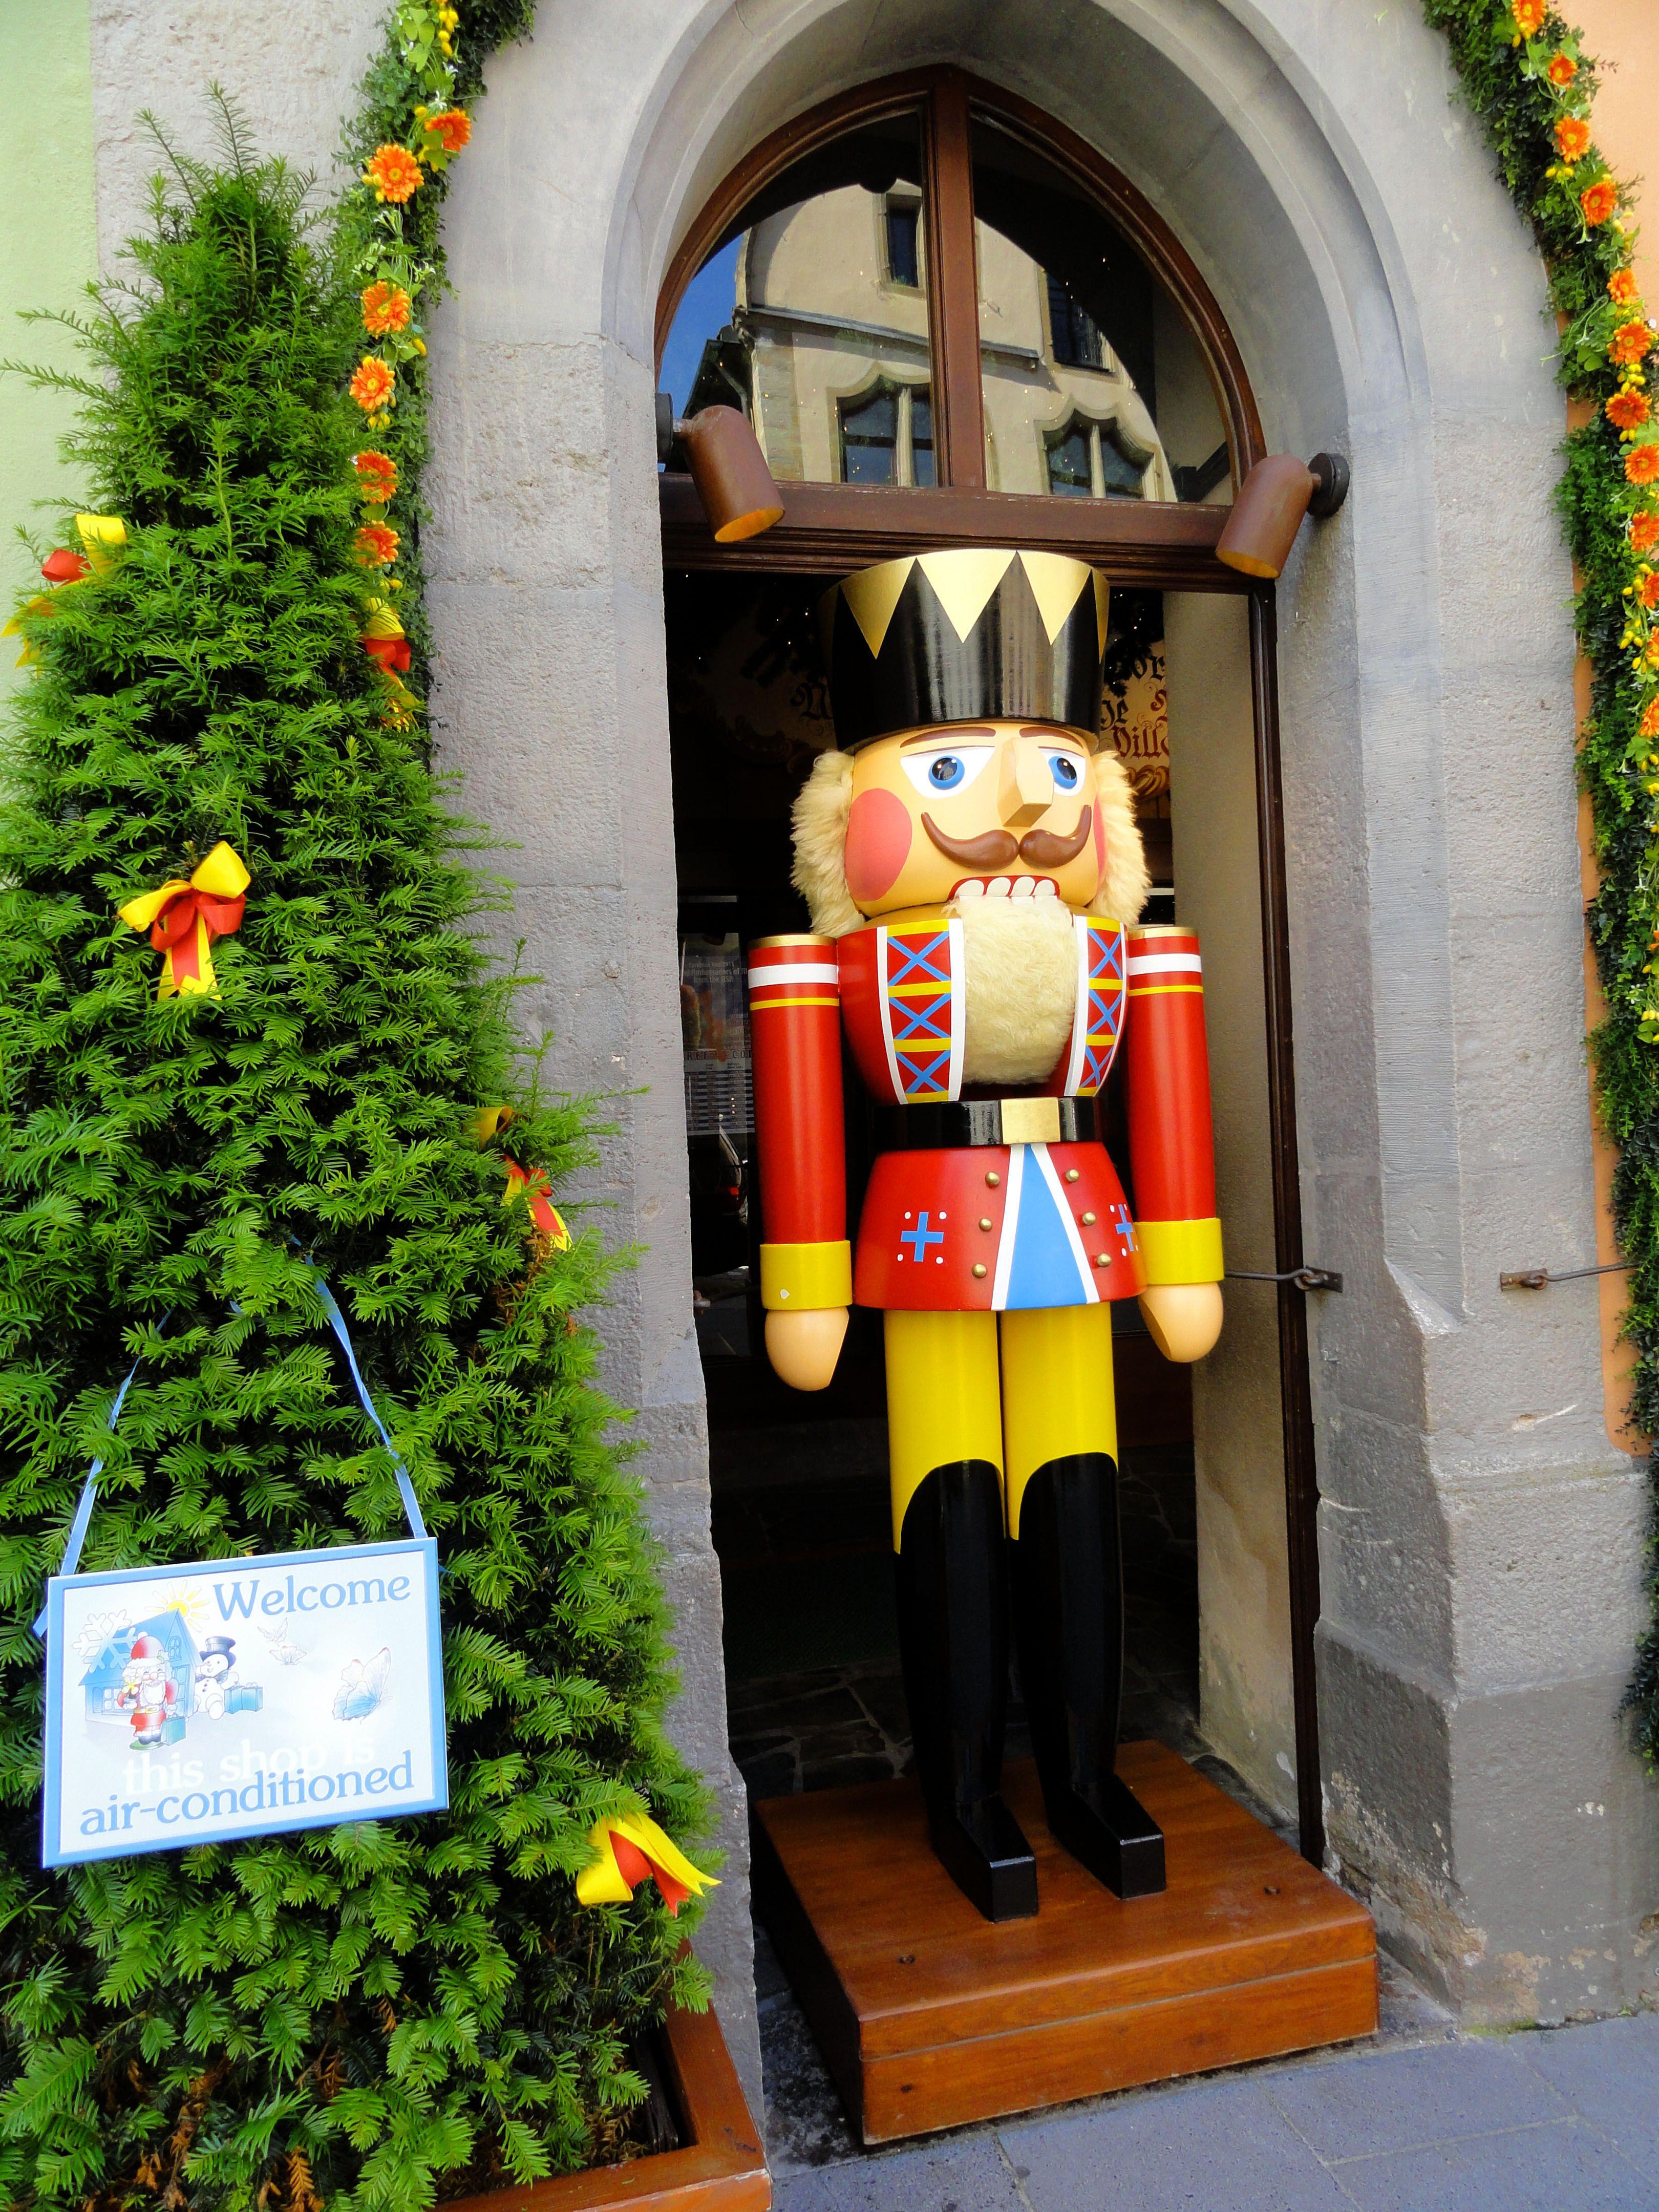 swordsman CHRISTMAS Decoration WOODEN SOLDIER PRINCE NUTCRACKER /& CROWN